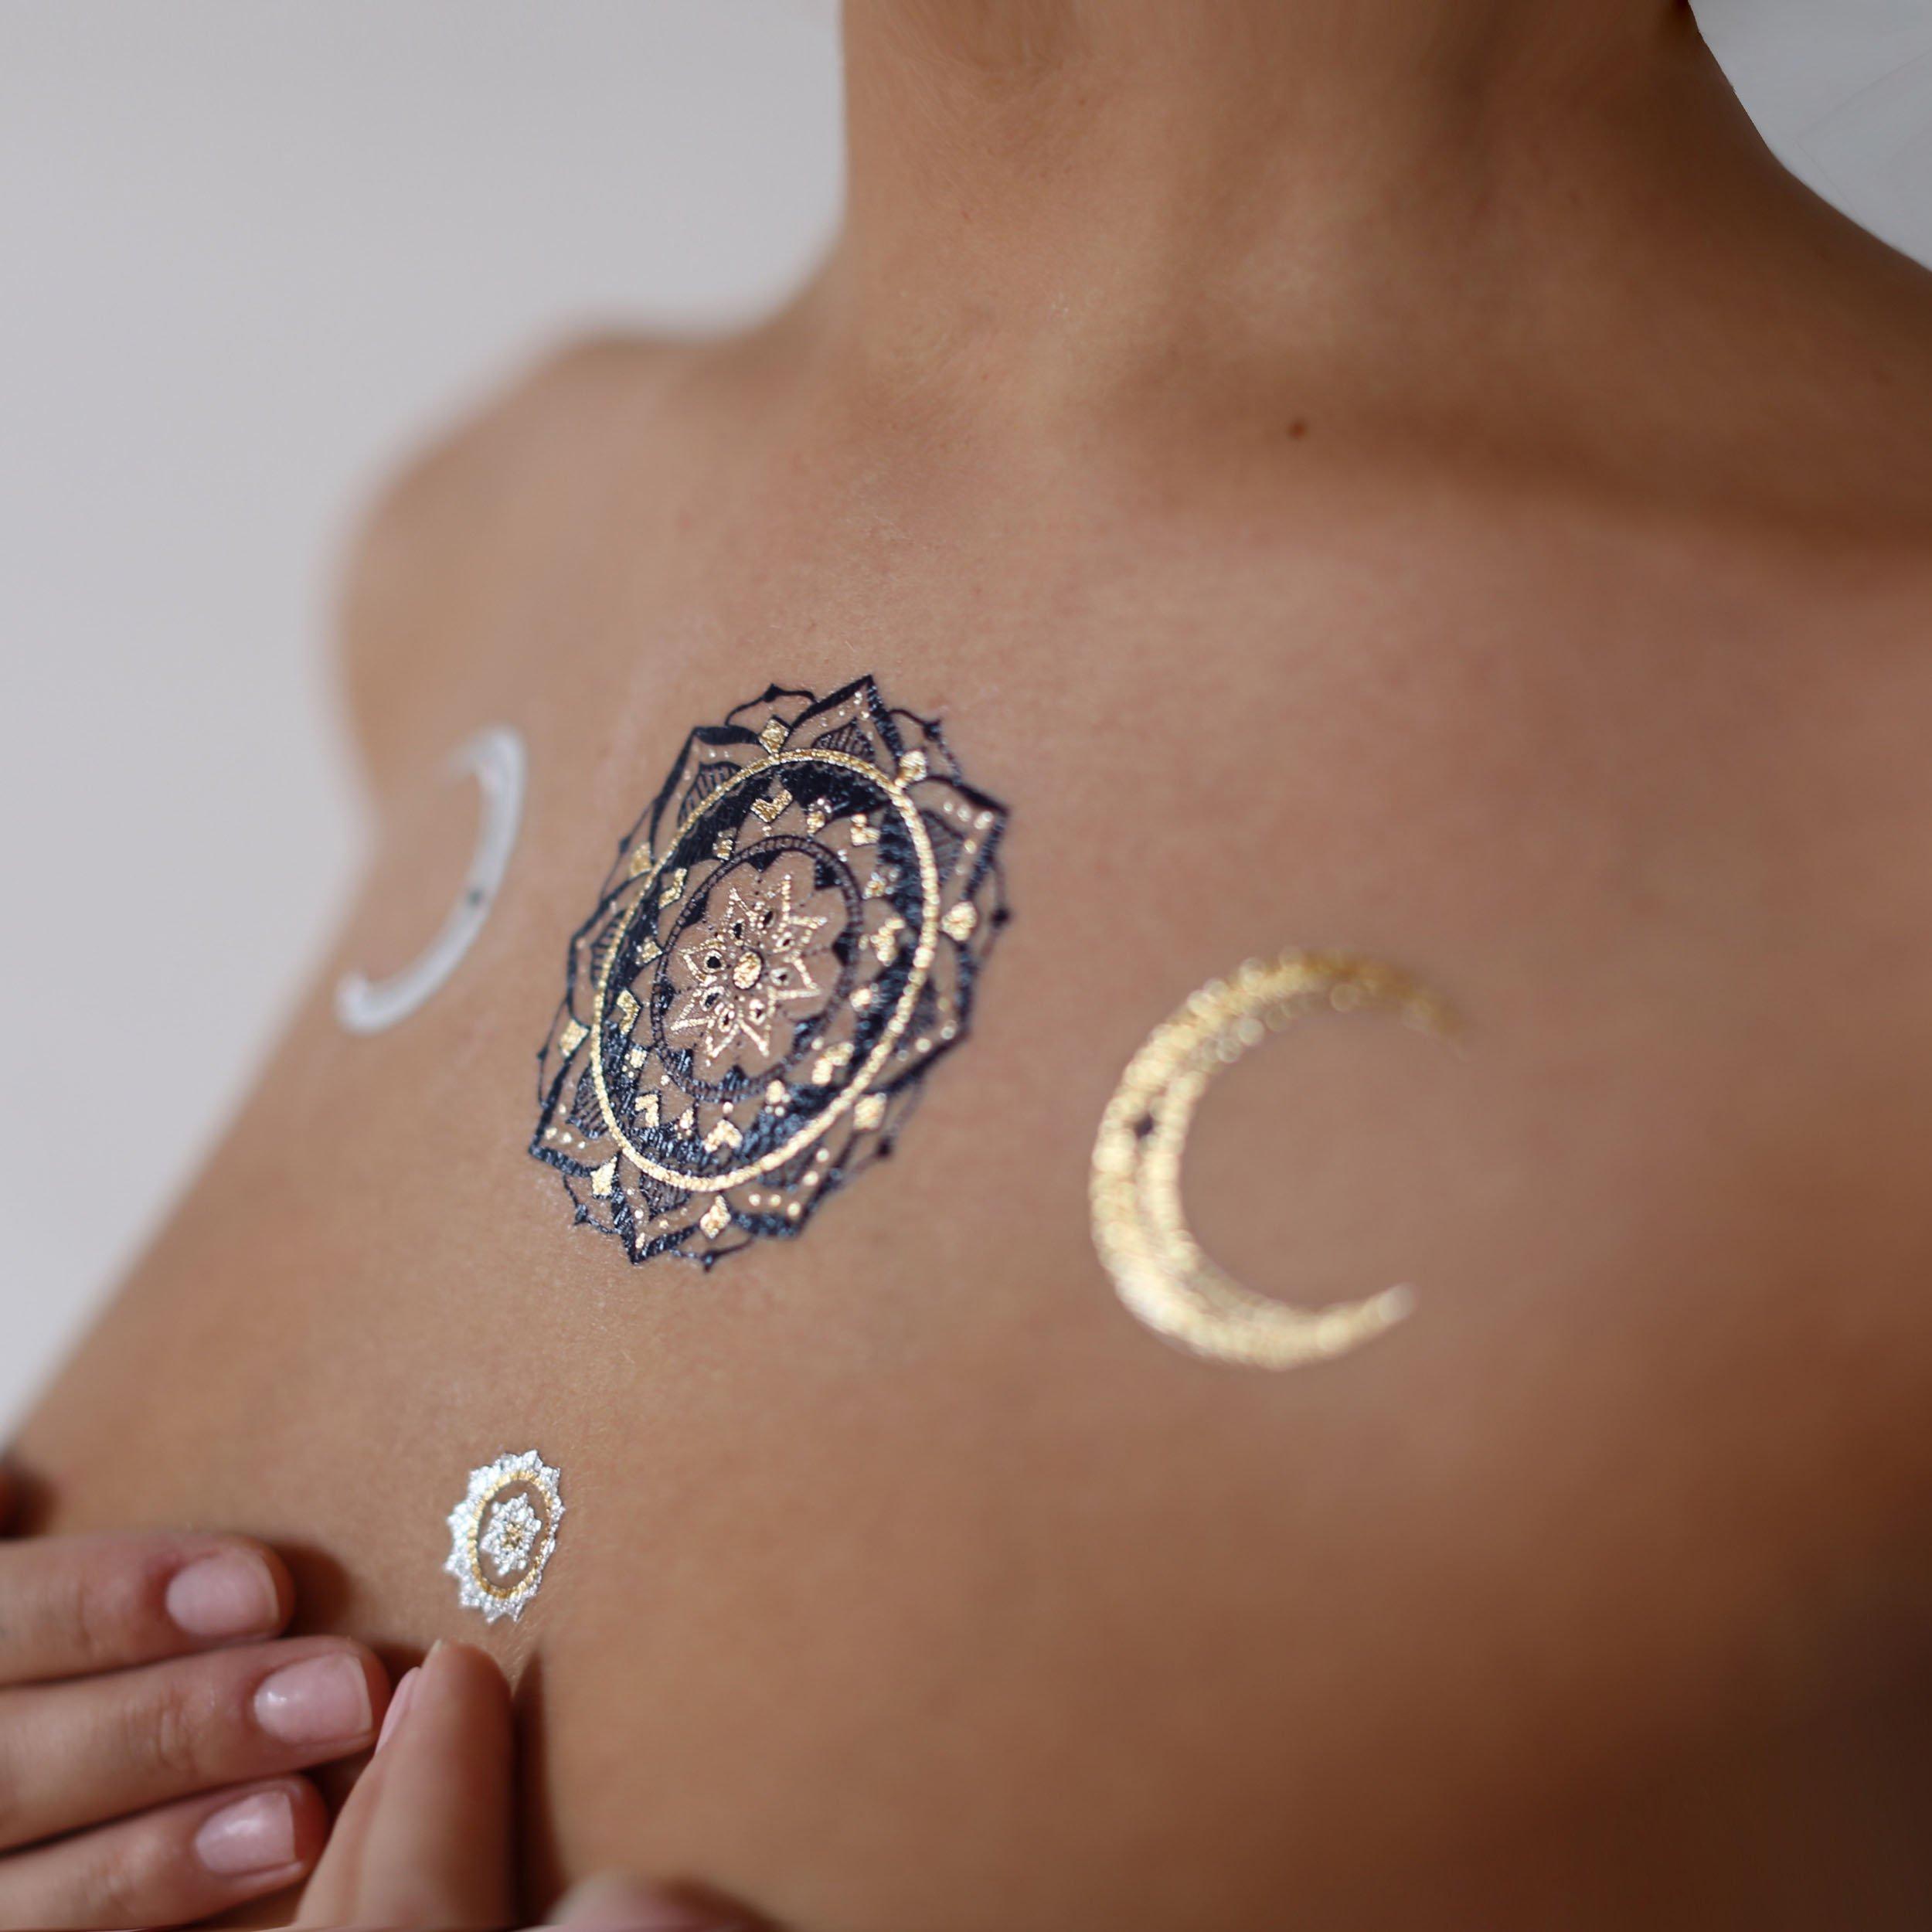 126210dc373d2 TribeTats Yoga-Inspired Premium Metallic Tattoos - Full Variety Set | 150+  Henna Inspired